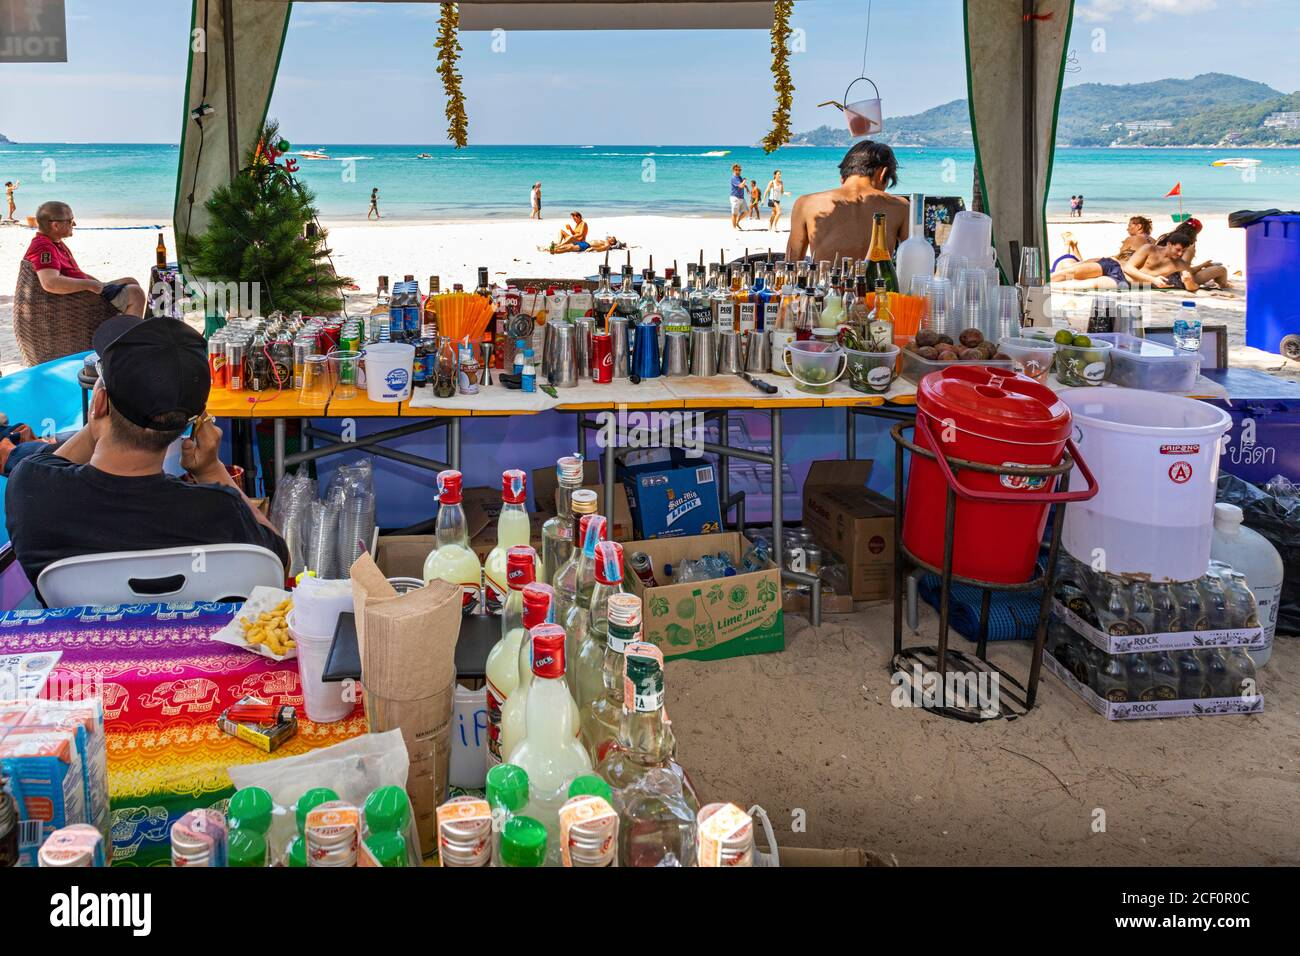 Bar de playa en la arena en Patong, Phuket, Tailandia Foto de stock